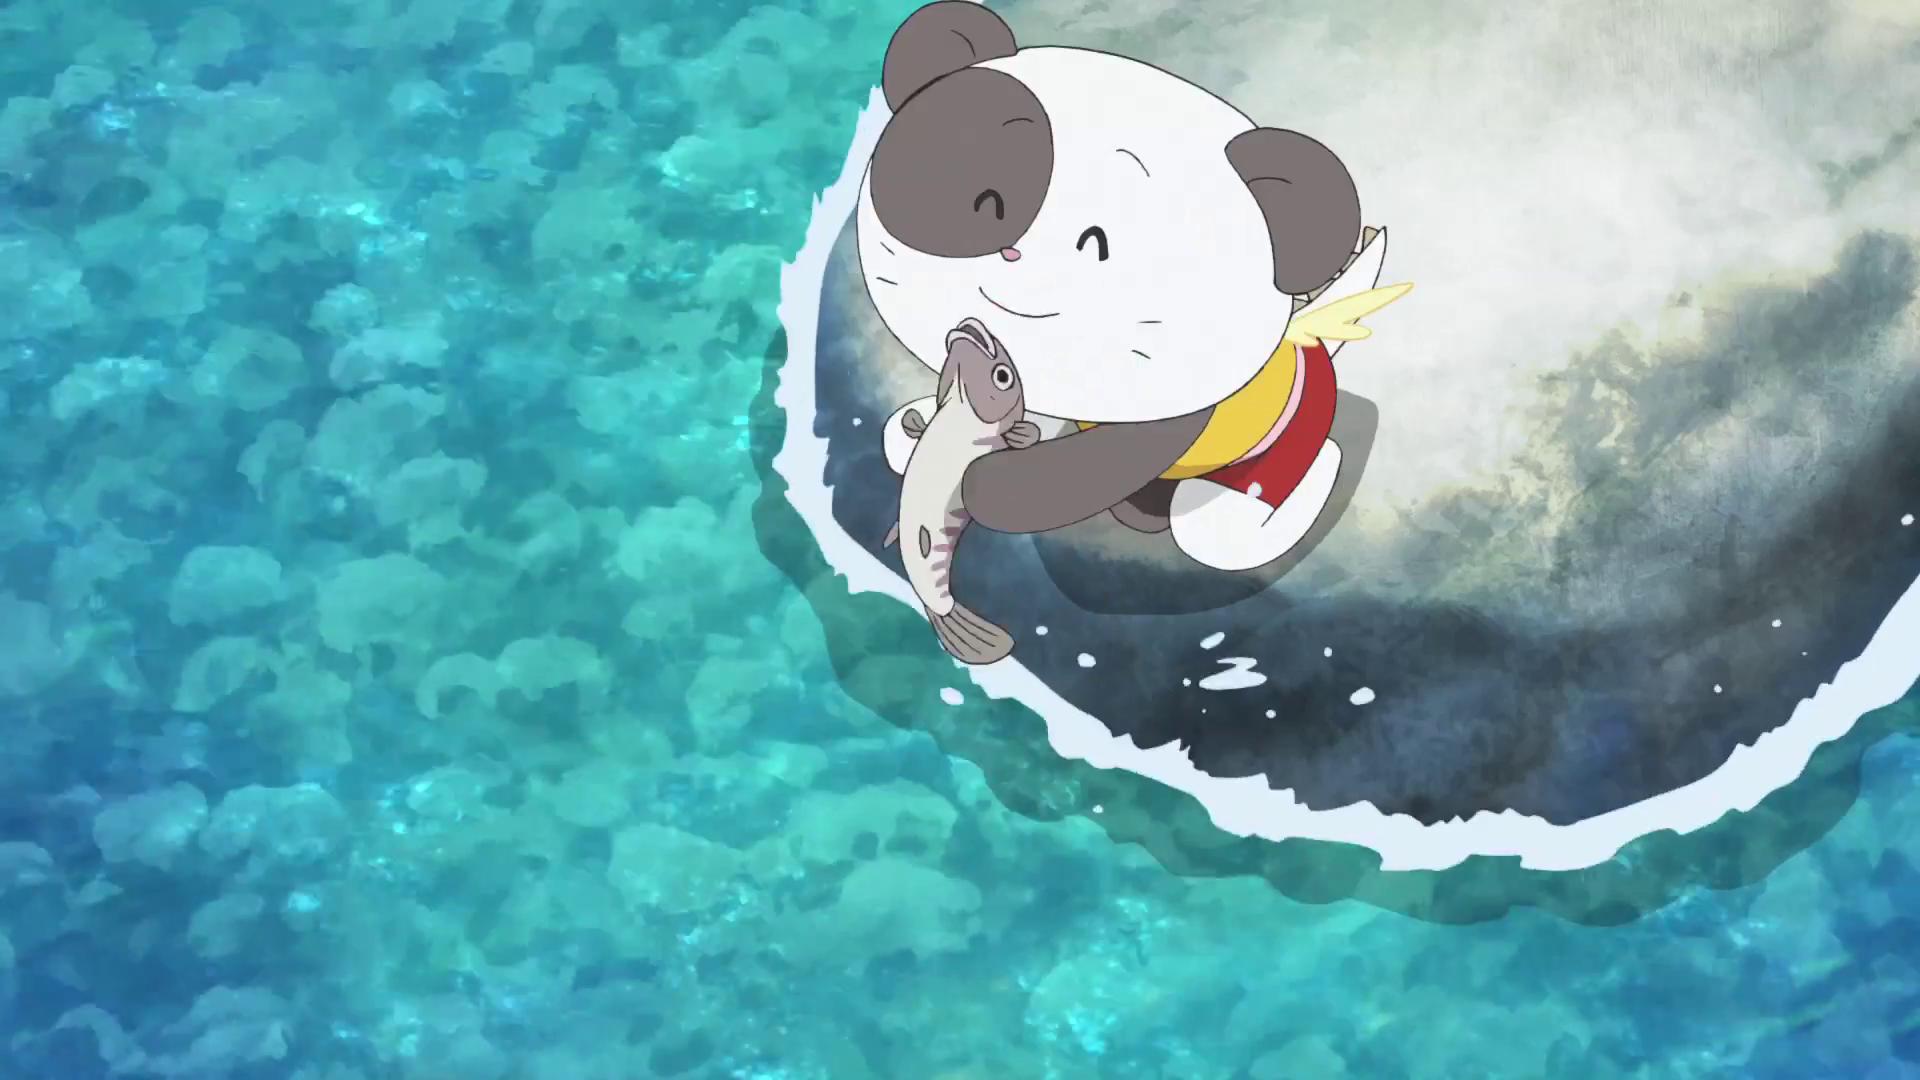 Chibi Panda Catches Fish